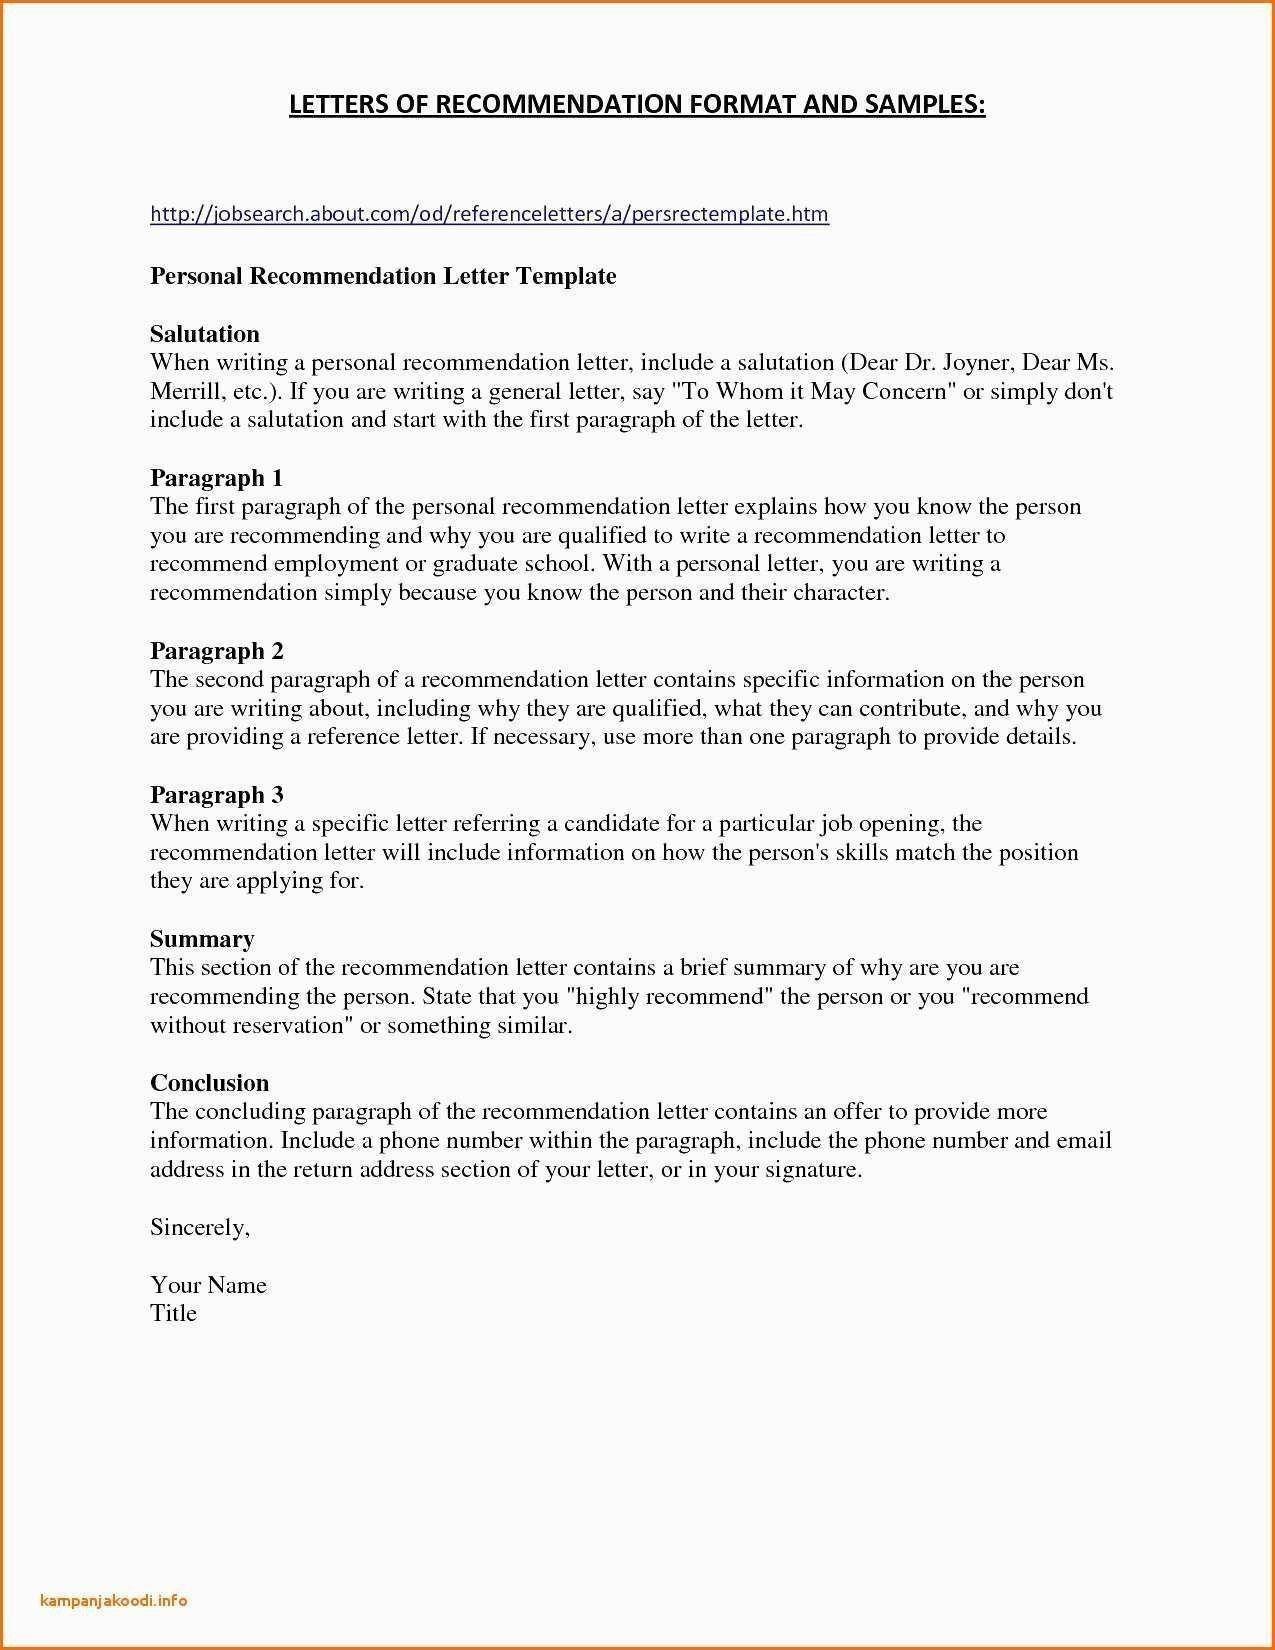 Download Best Of Government Job Offer Letter At Https Gprime Us Government Job Offer Letter Cover Letter For Resume Letter Templates Lettering